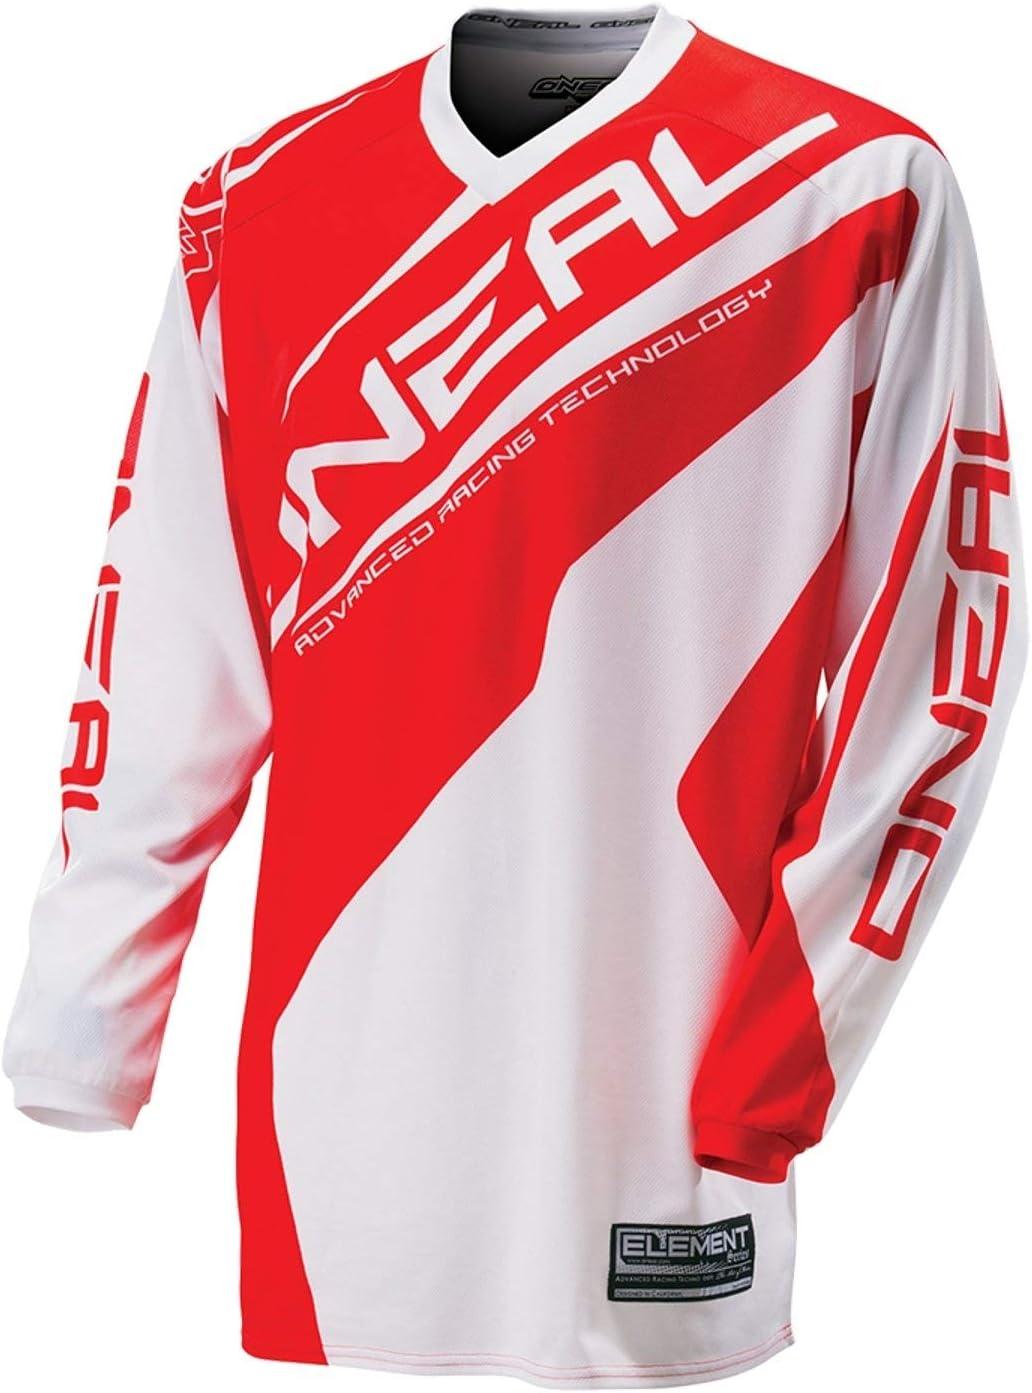 0024r 31 O Neal Element MX Jersey Racewear Bianco Rosso Maglia Moot ocross Enduro Offroad Downhill